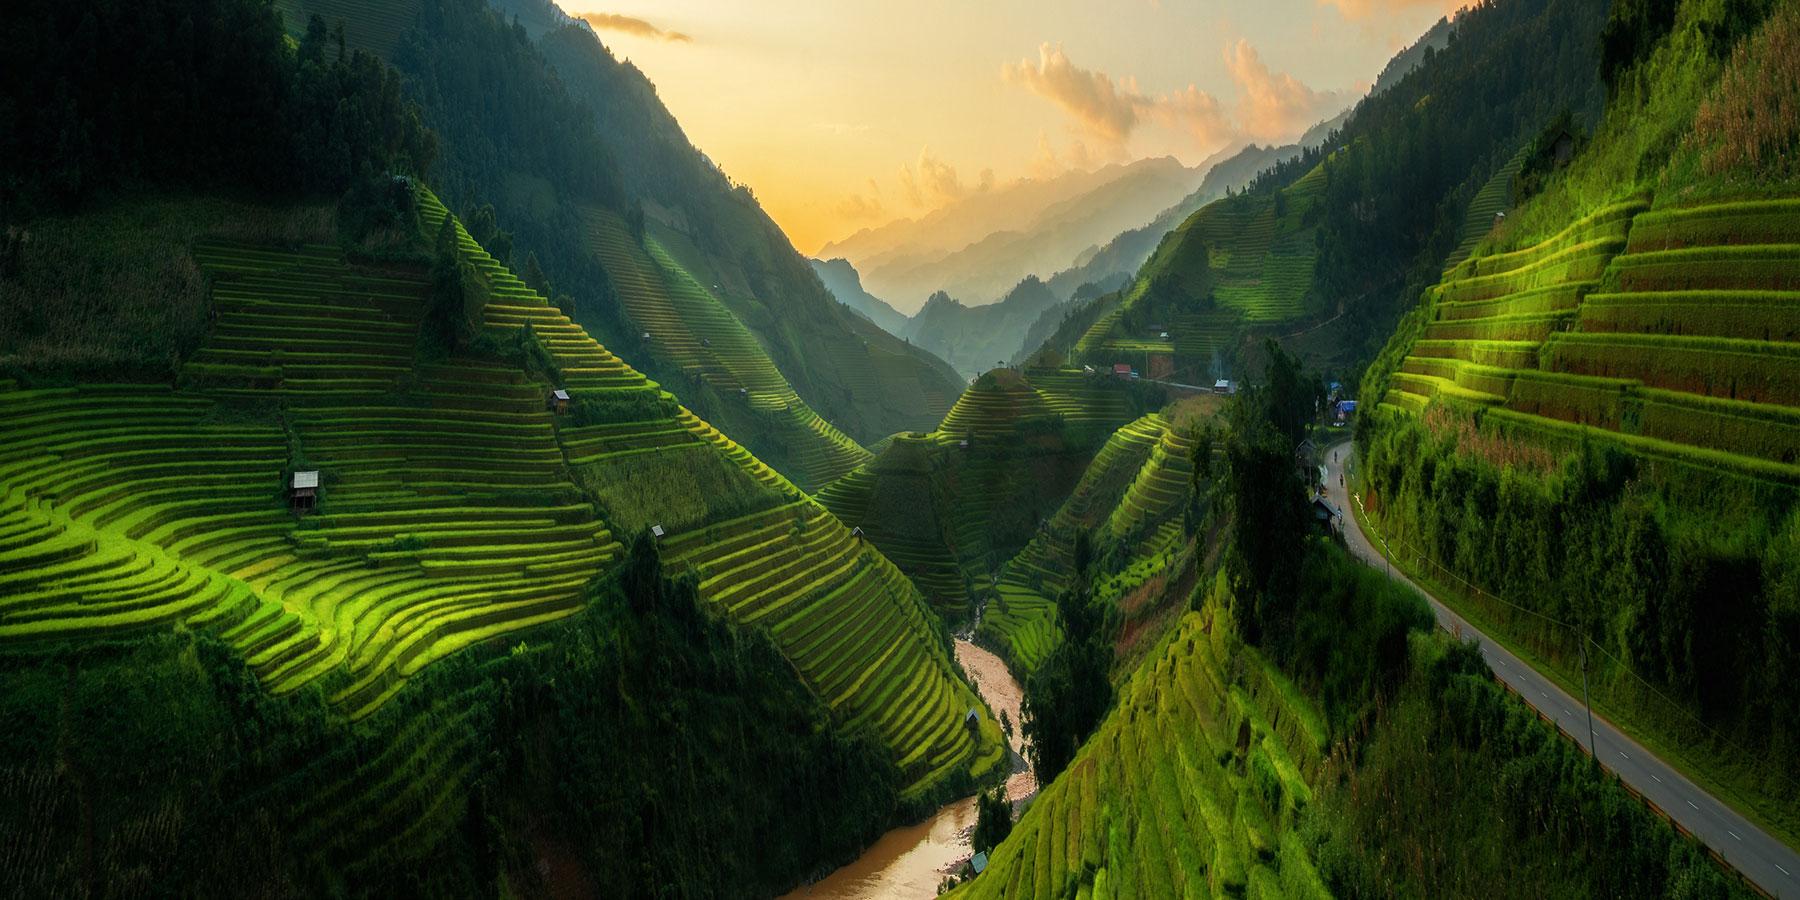 walks in the borderlands burma china vietnam alumni